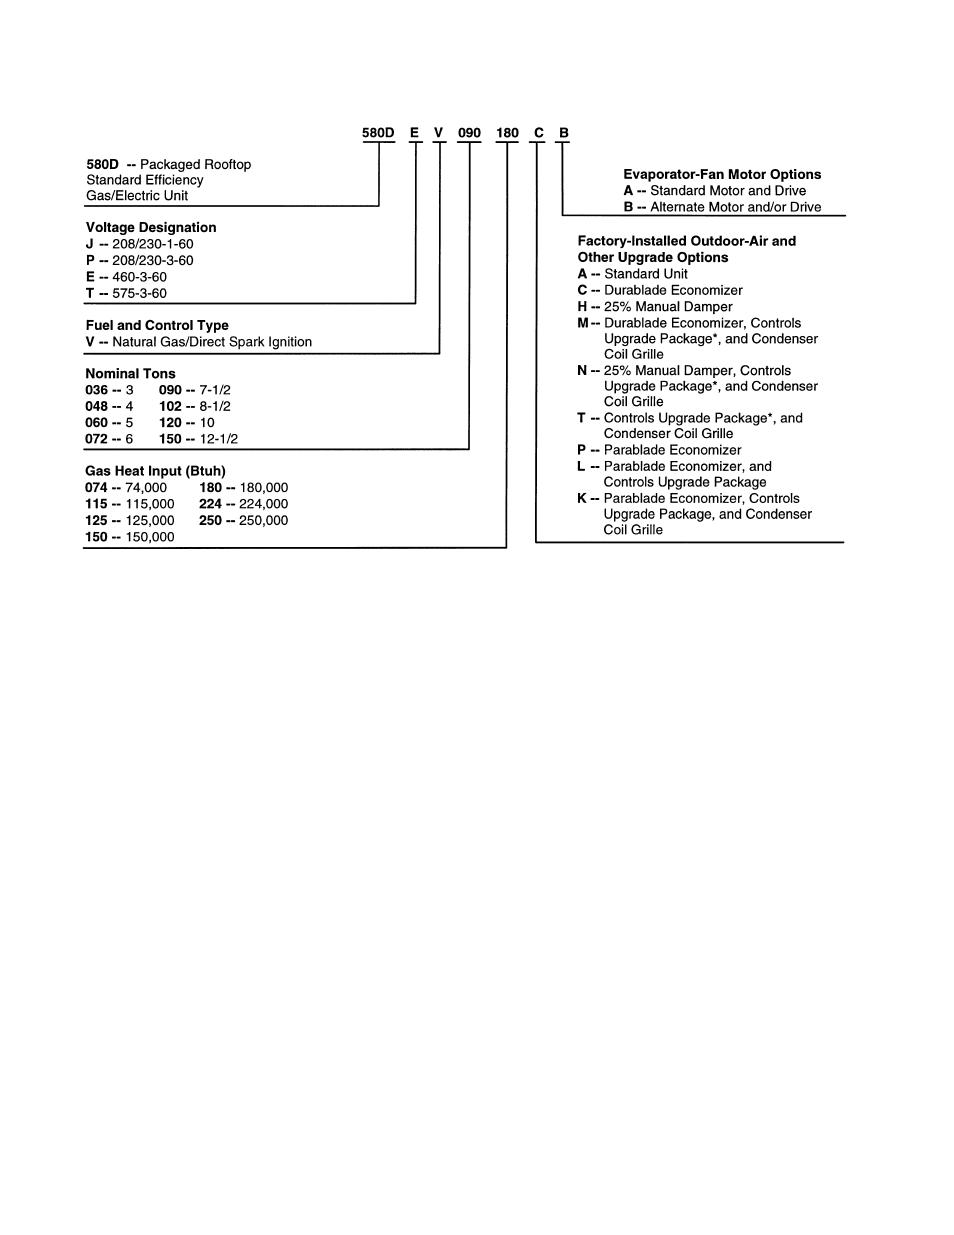 BRYANT 580D PDF